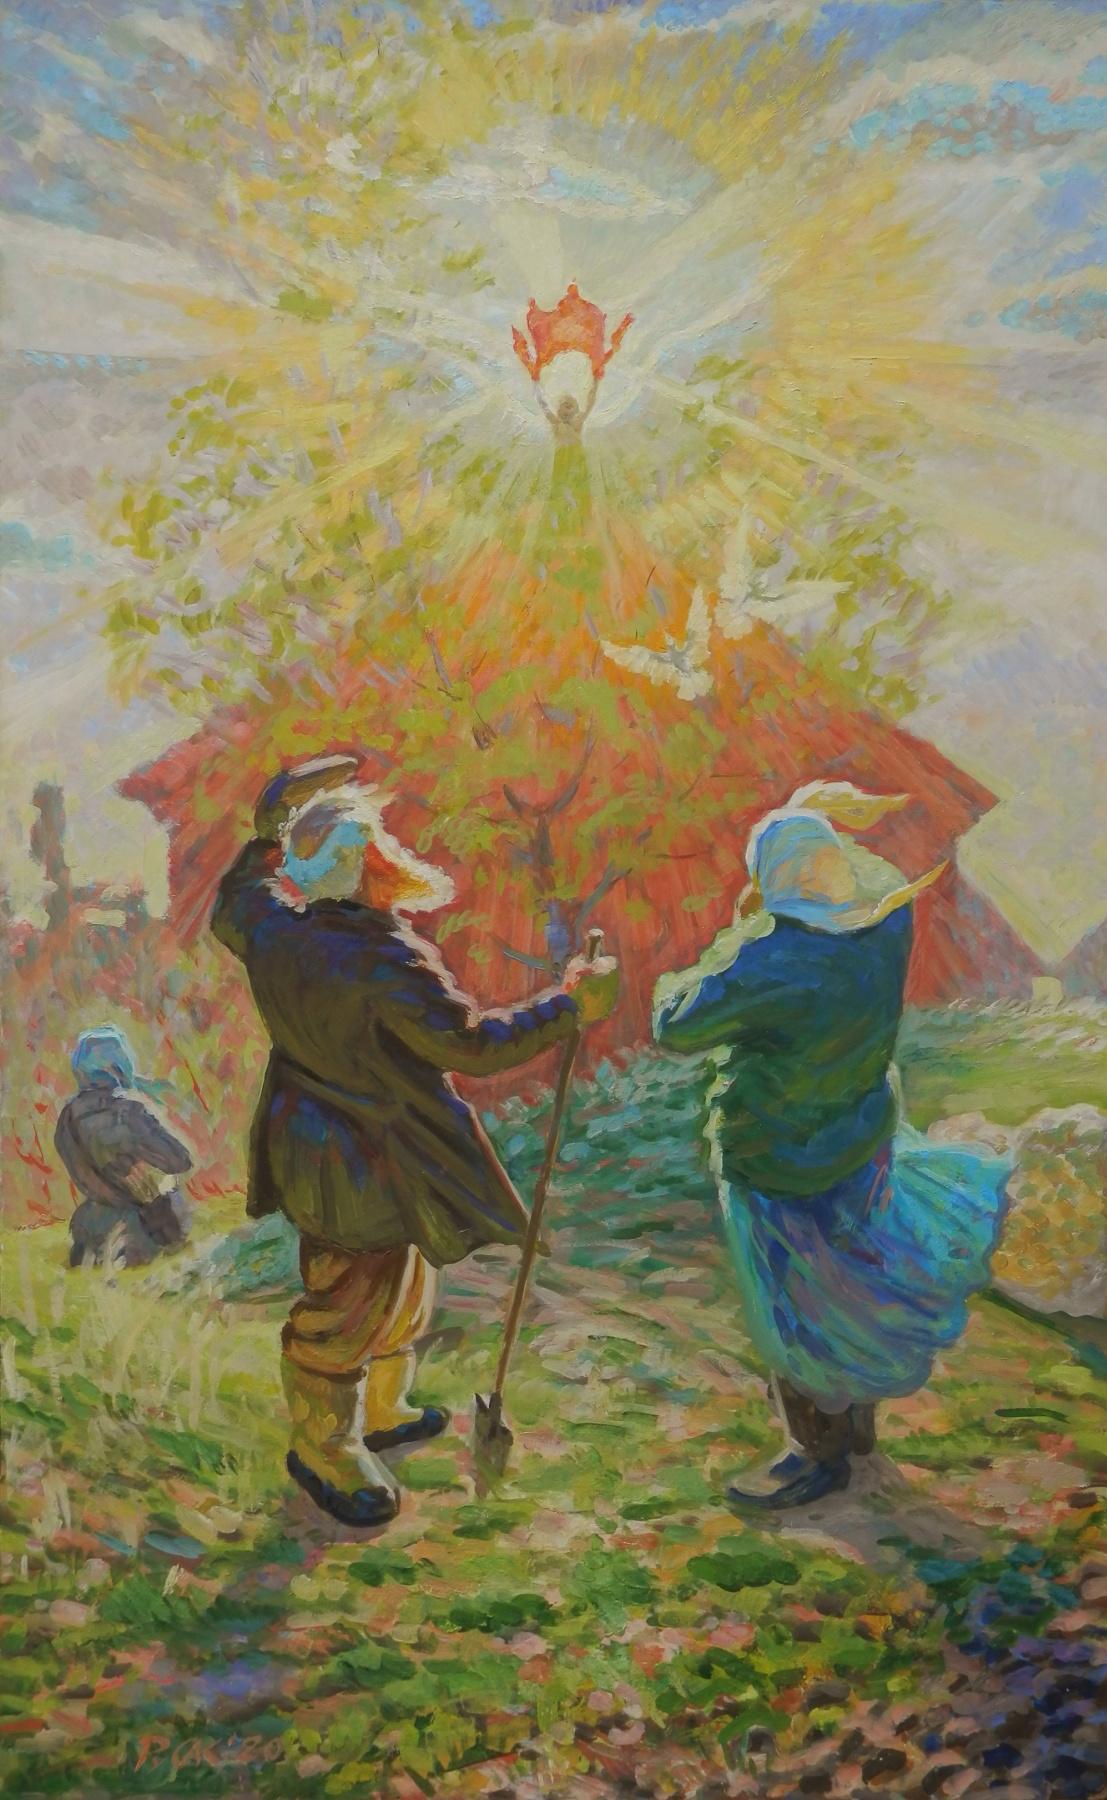 Alexey RusAC. Light of Victory. Nerekhta